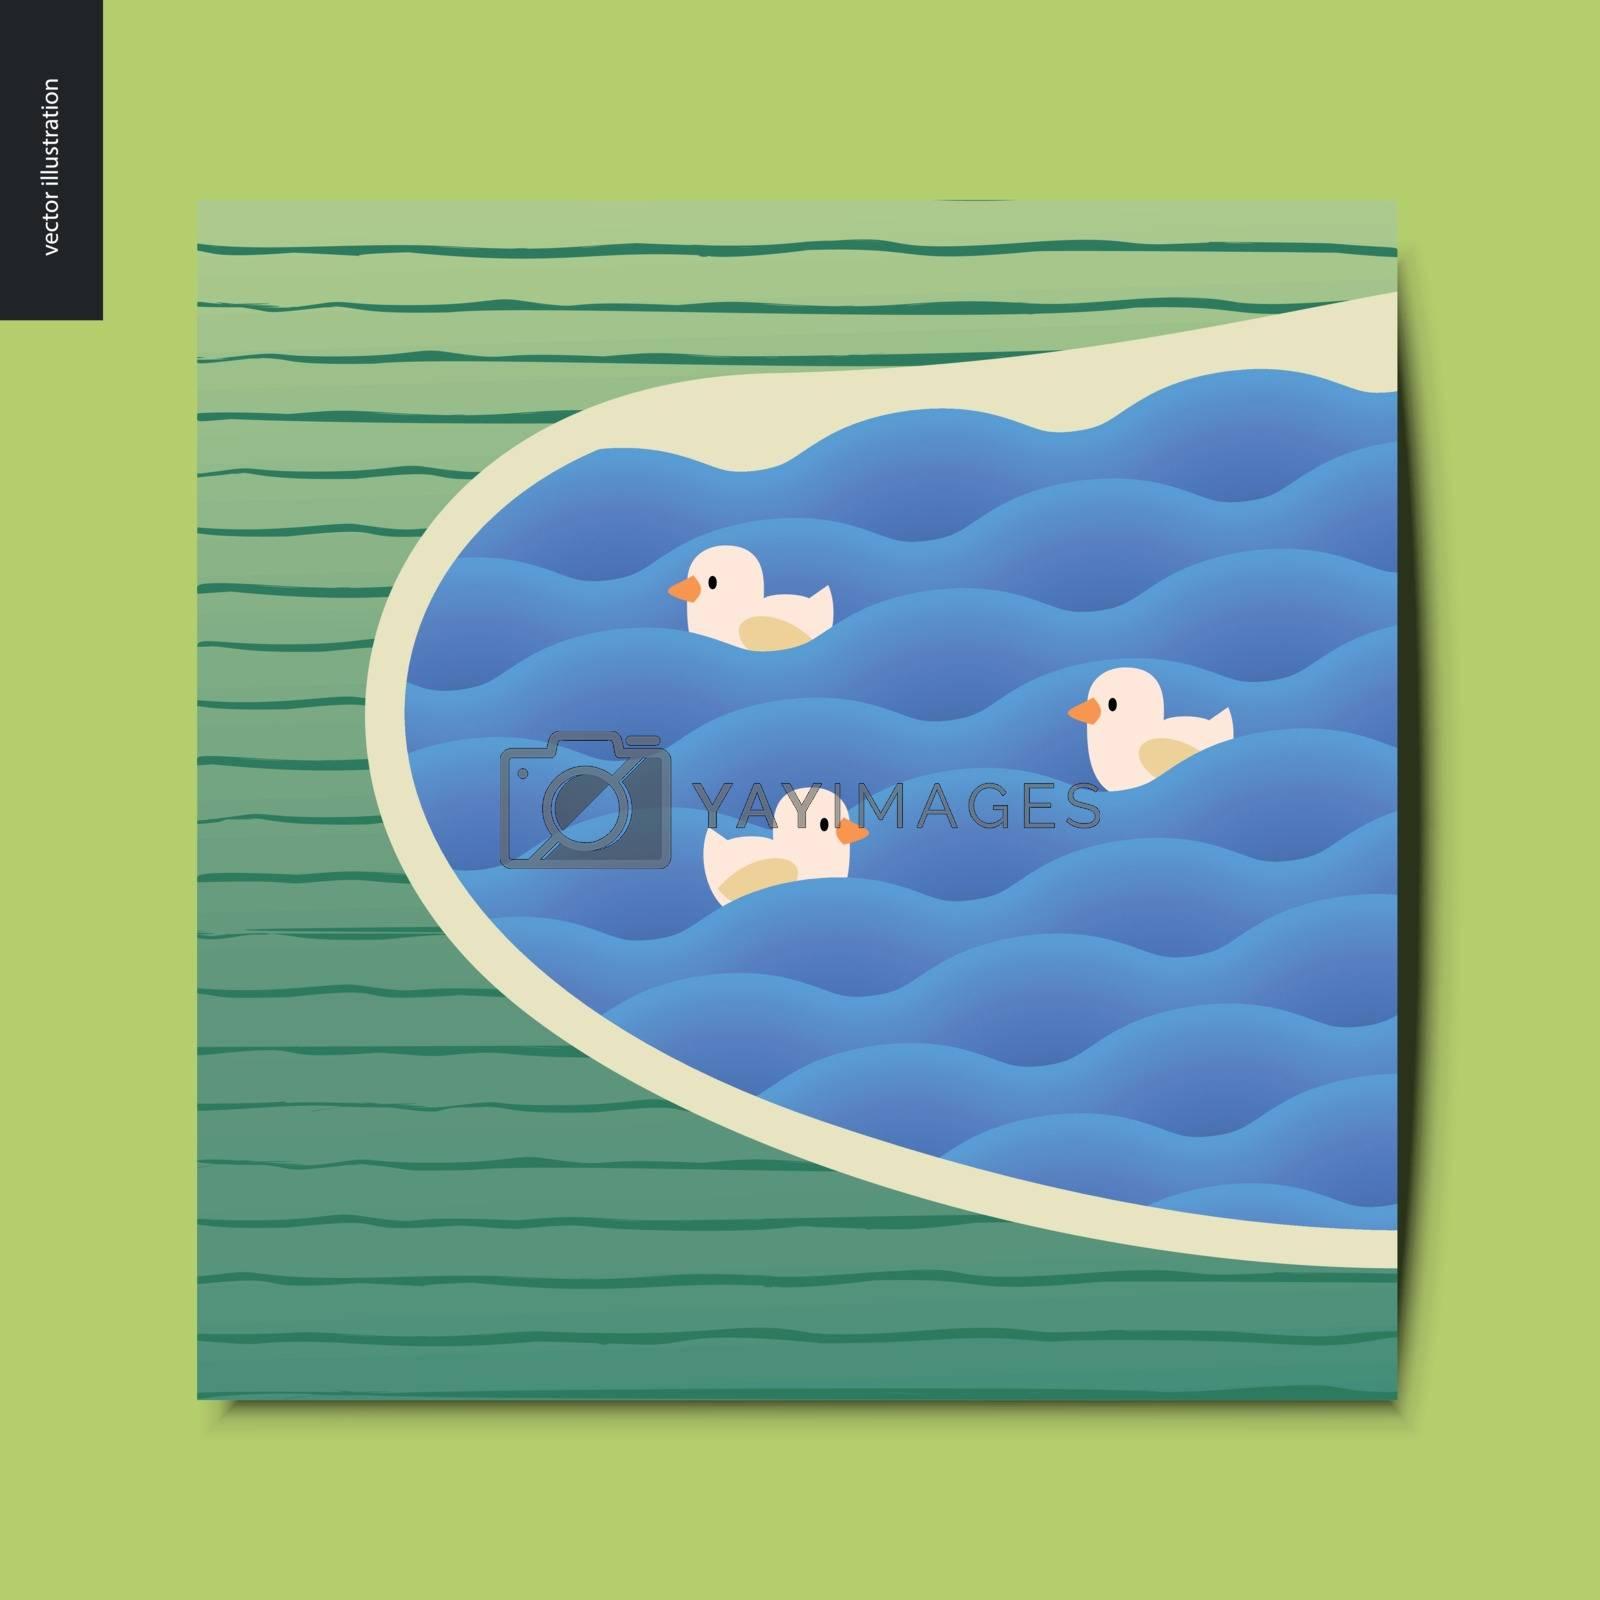 Simple things - lake by grivina